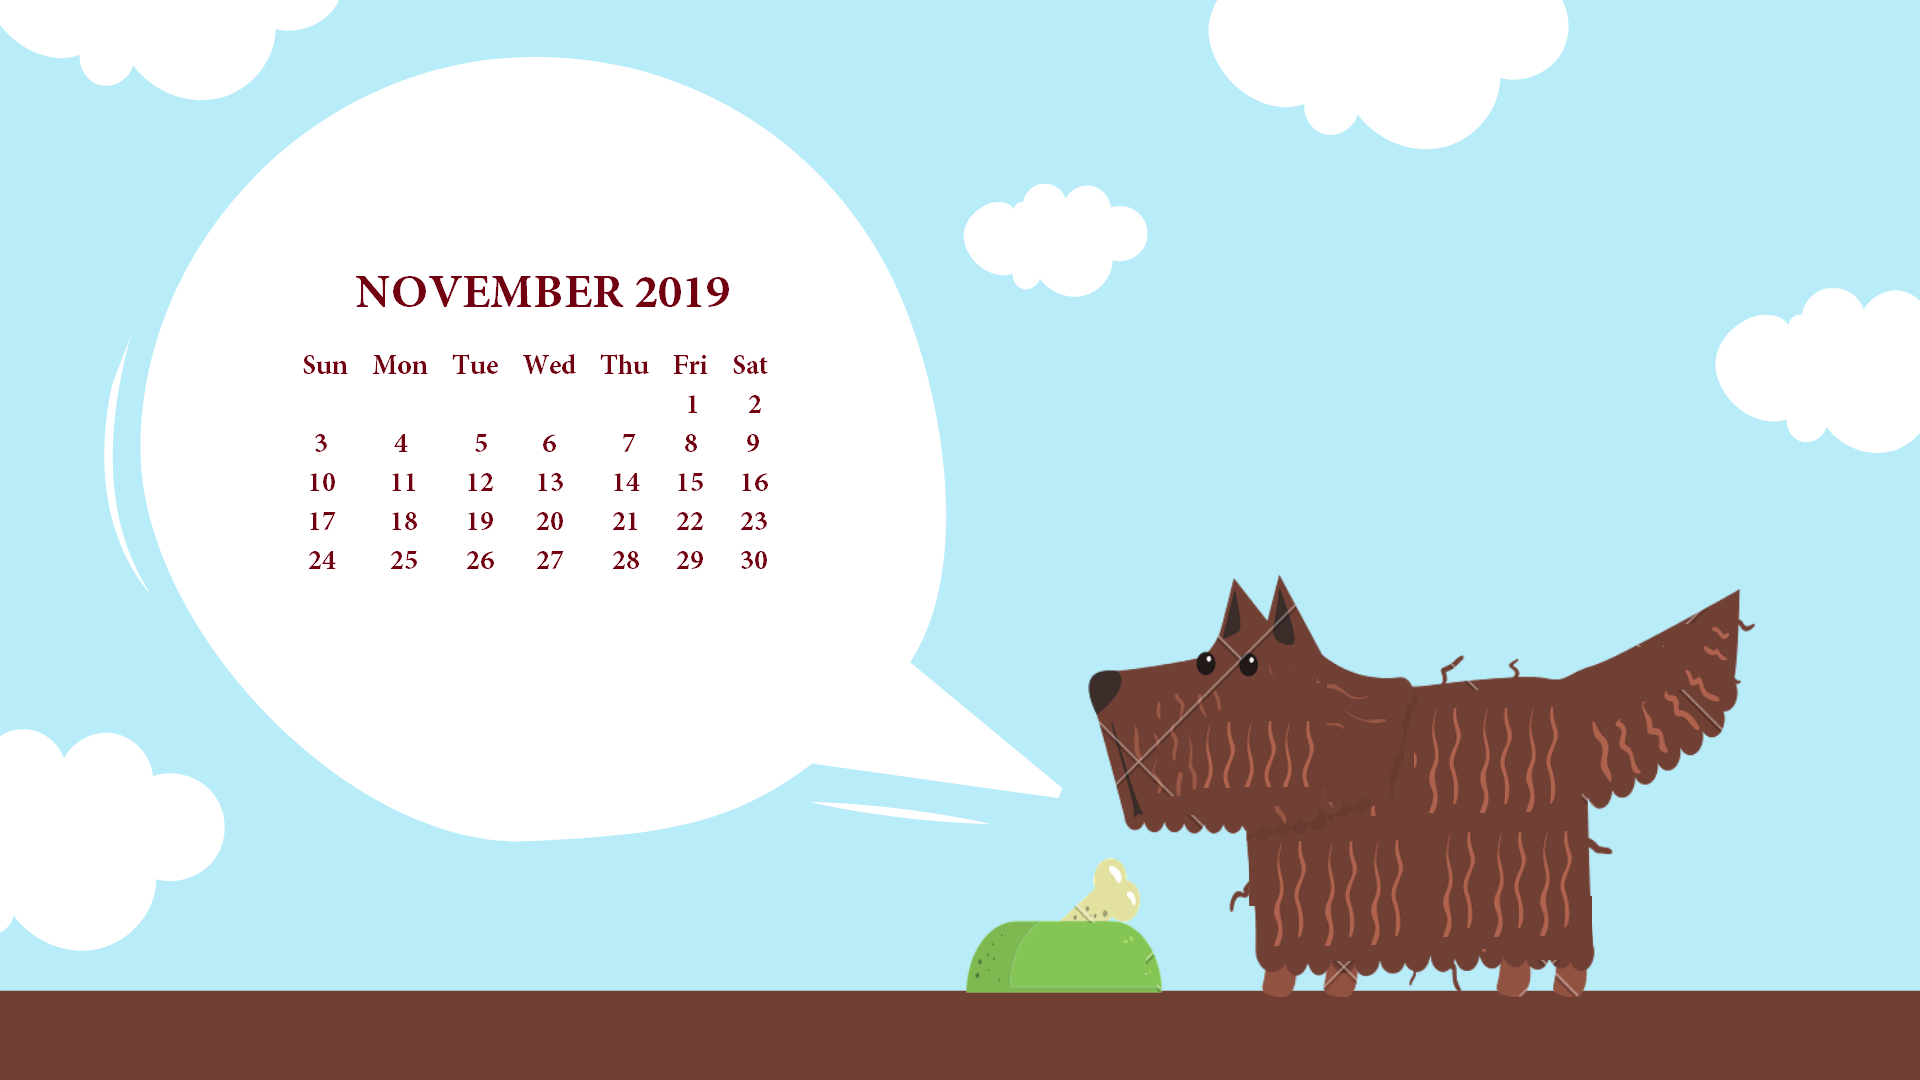 November 2019 Desktop Calendar Wallpaper November